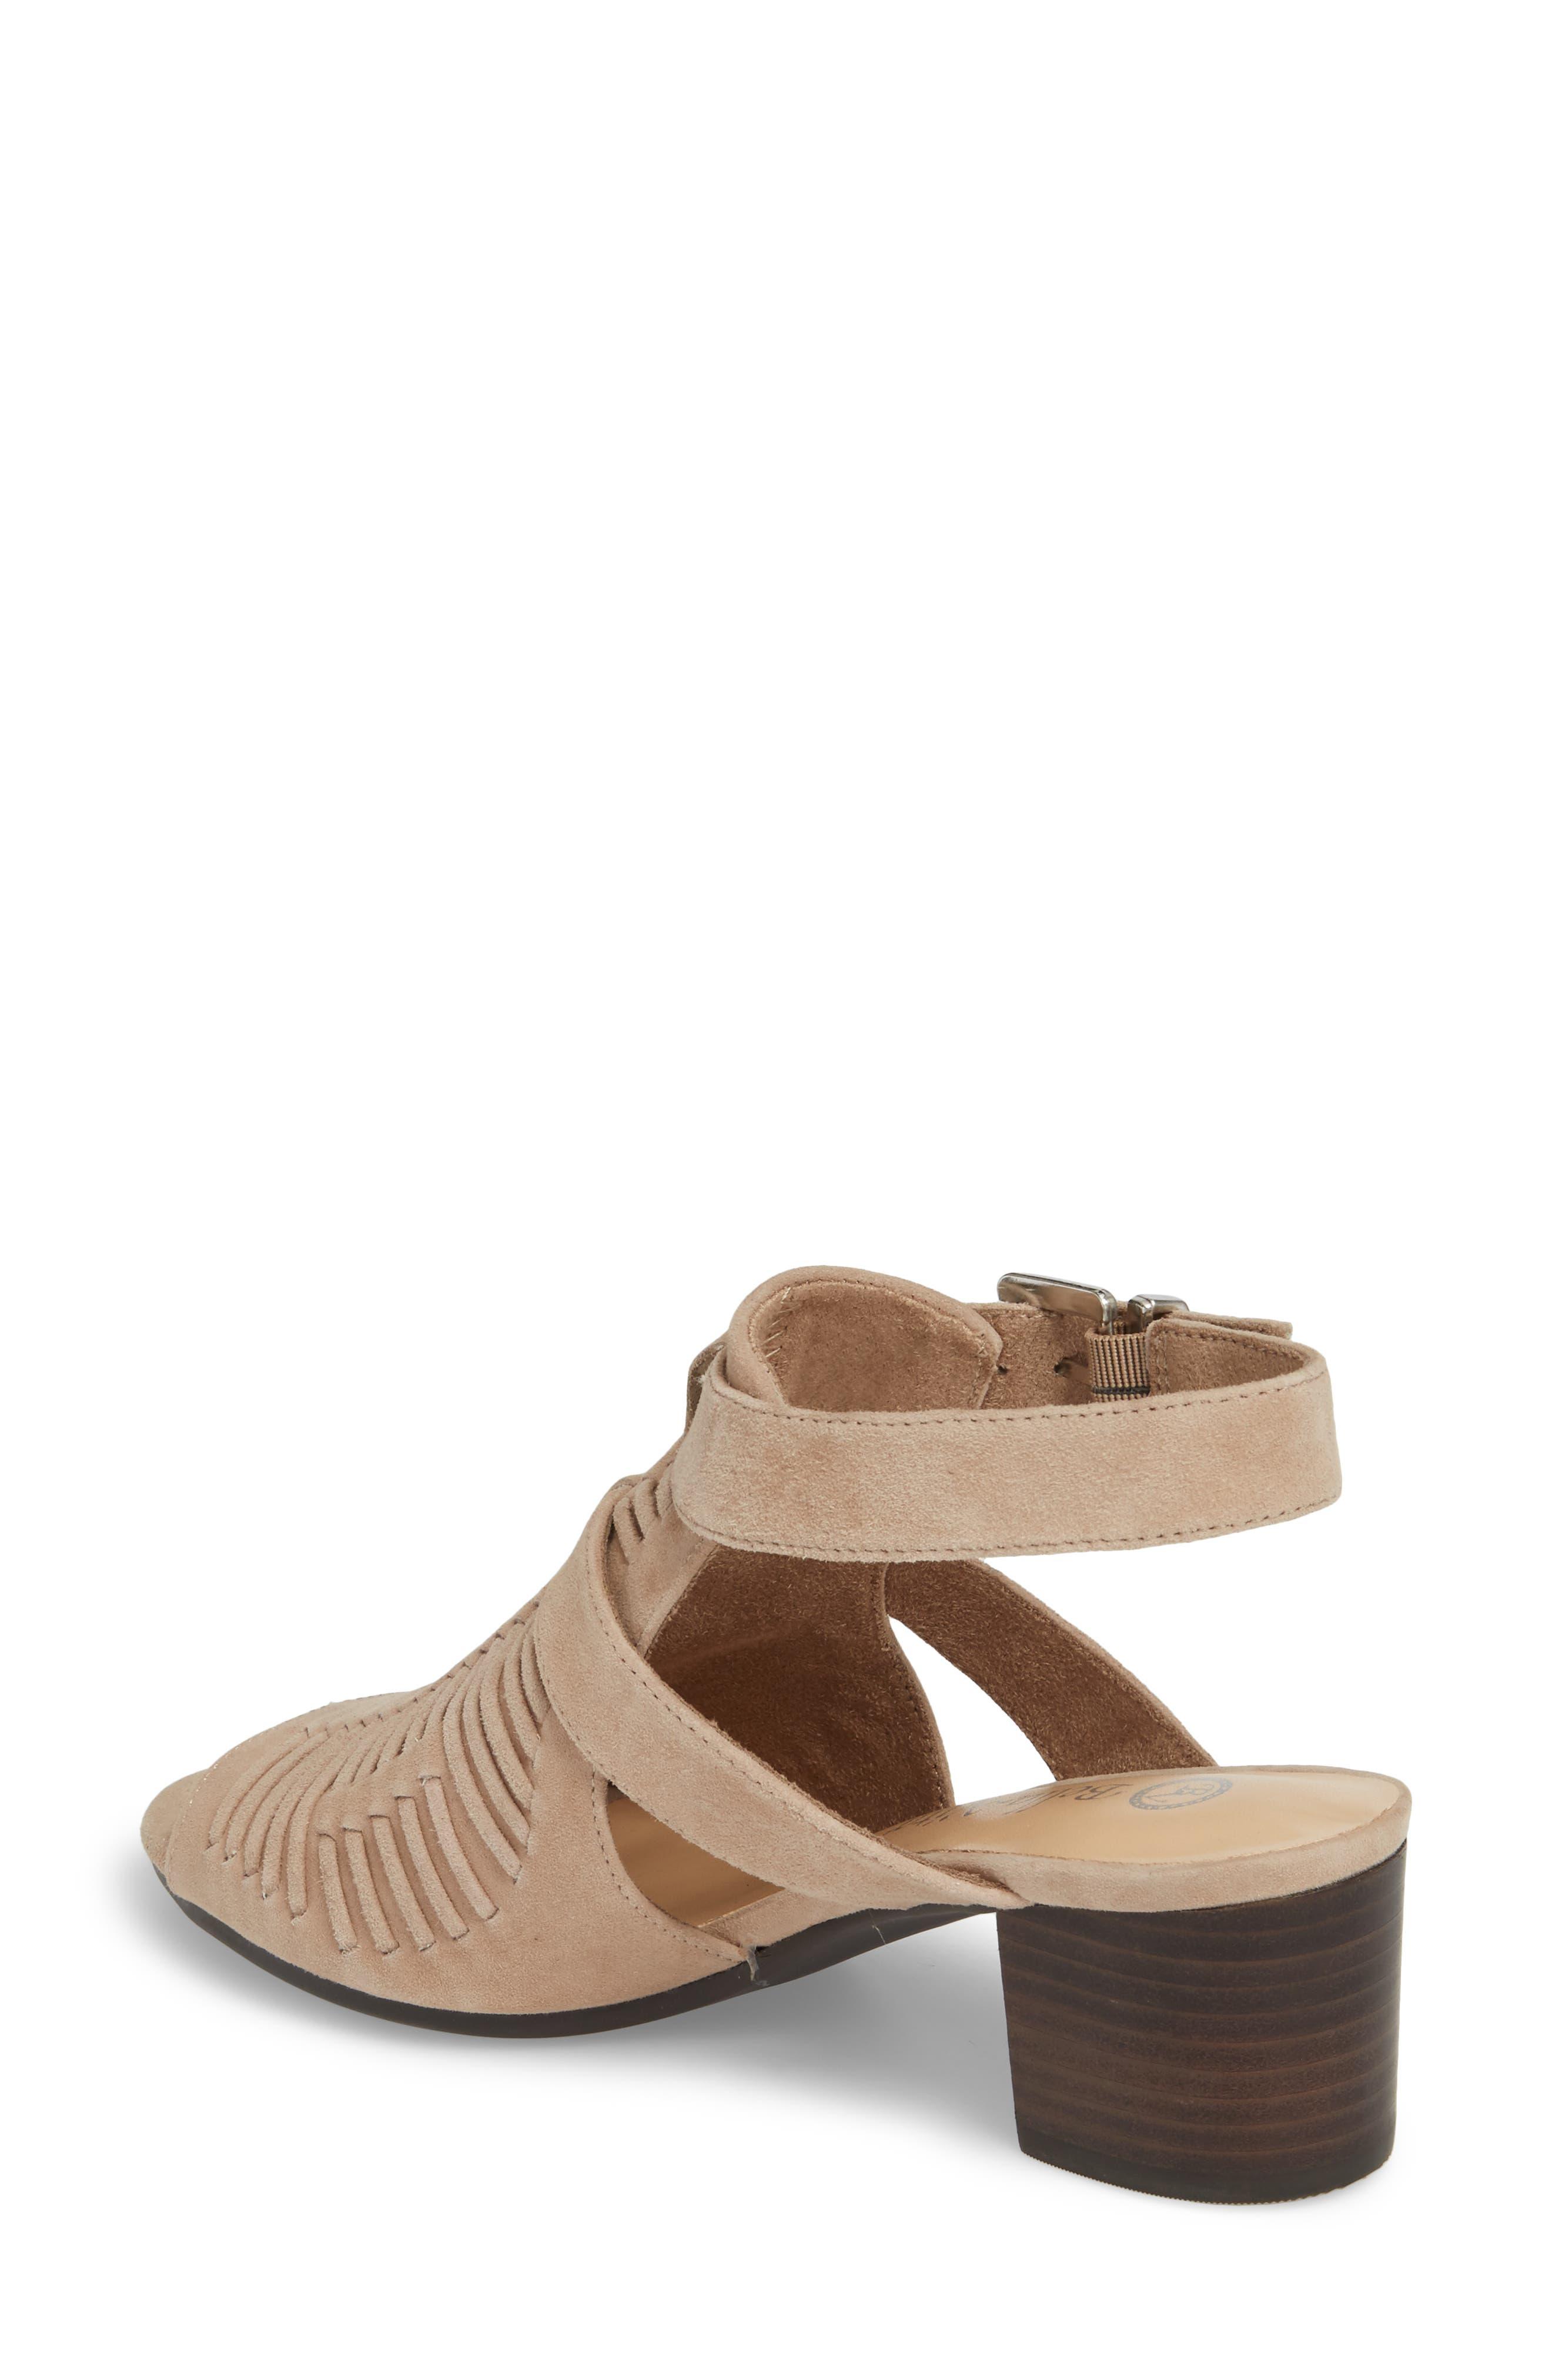 Finley Ankle Strap Sandal,                             Alternate thumbnail 9, color,